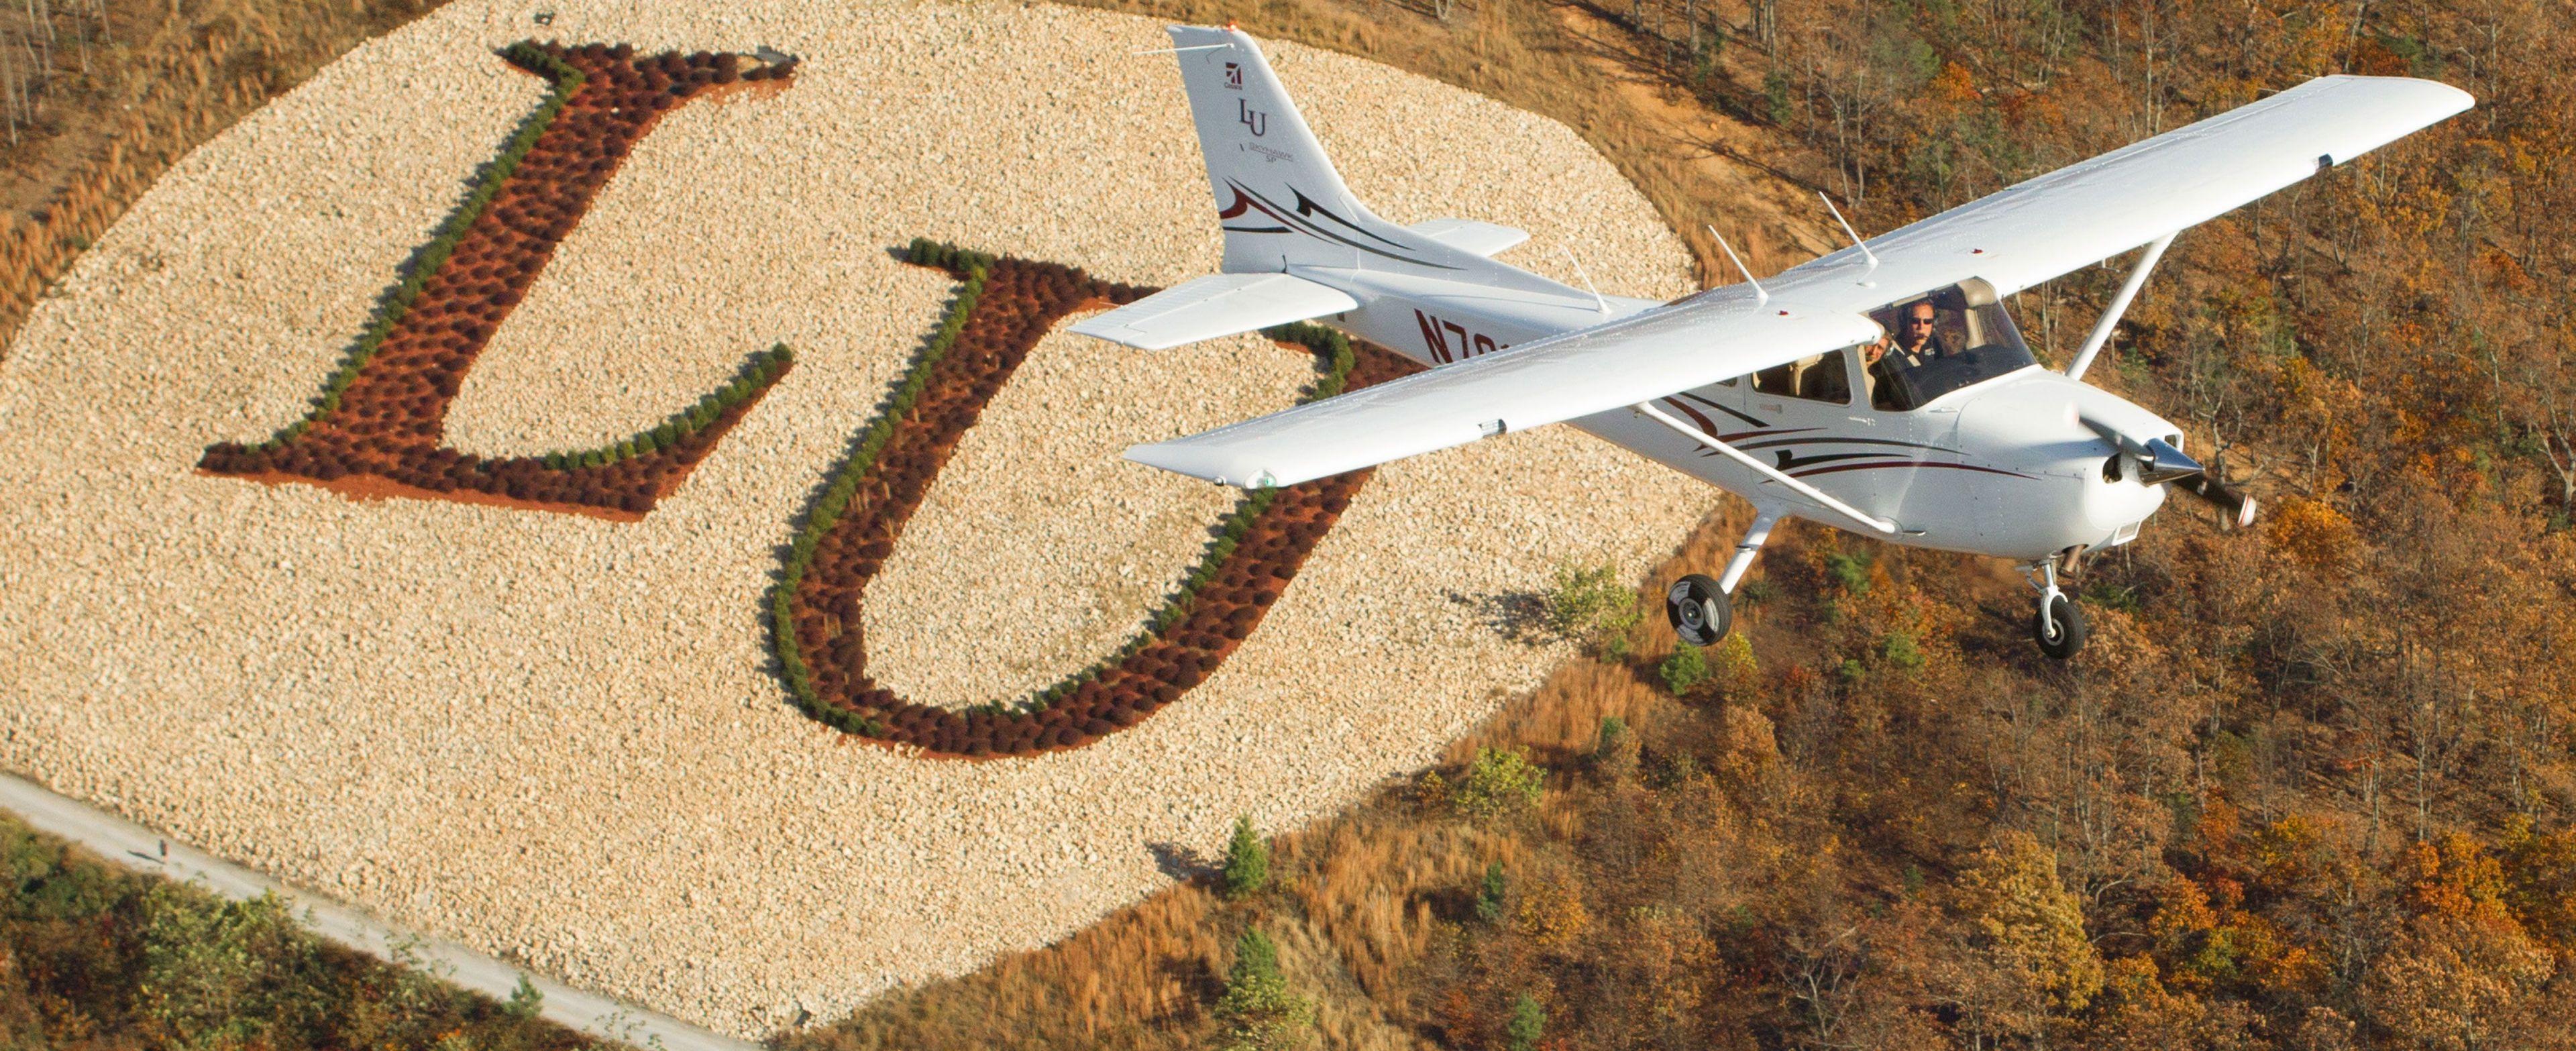 Liberty University Bachelor Of Science In Aeronautics BS In Aeronautics Flight Degrees Unmanned Aerial Systems UAS